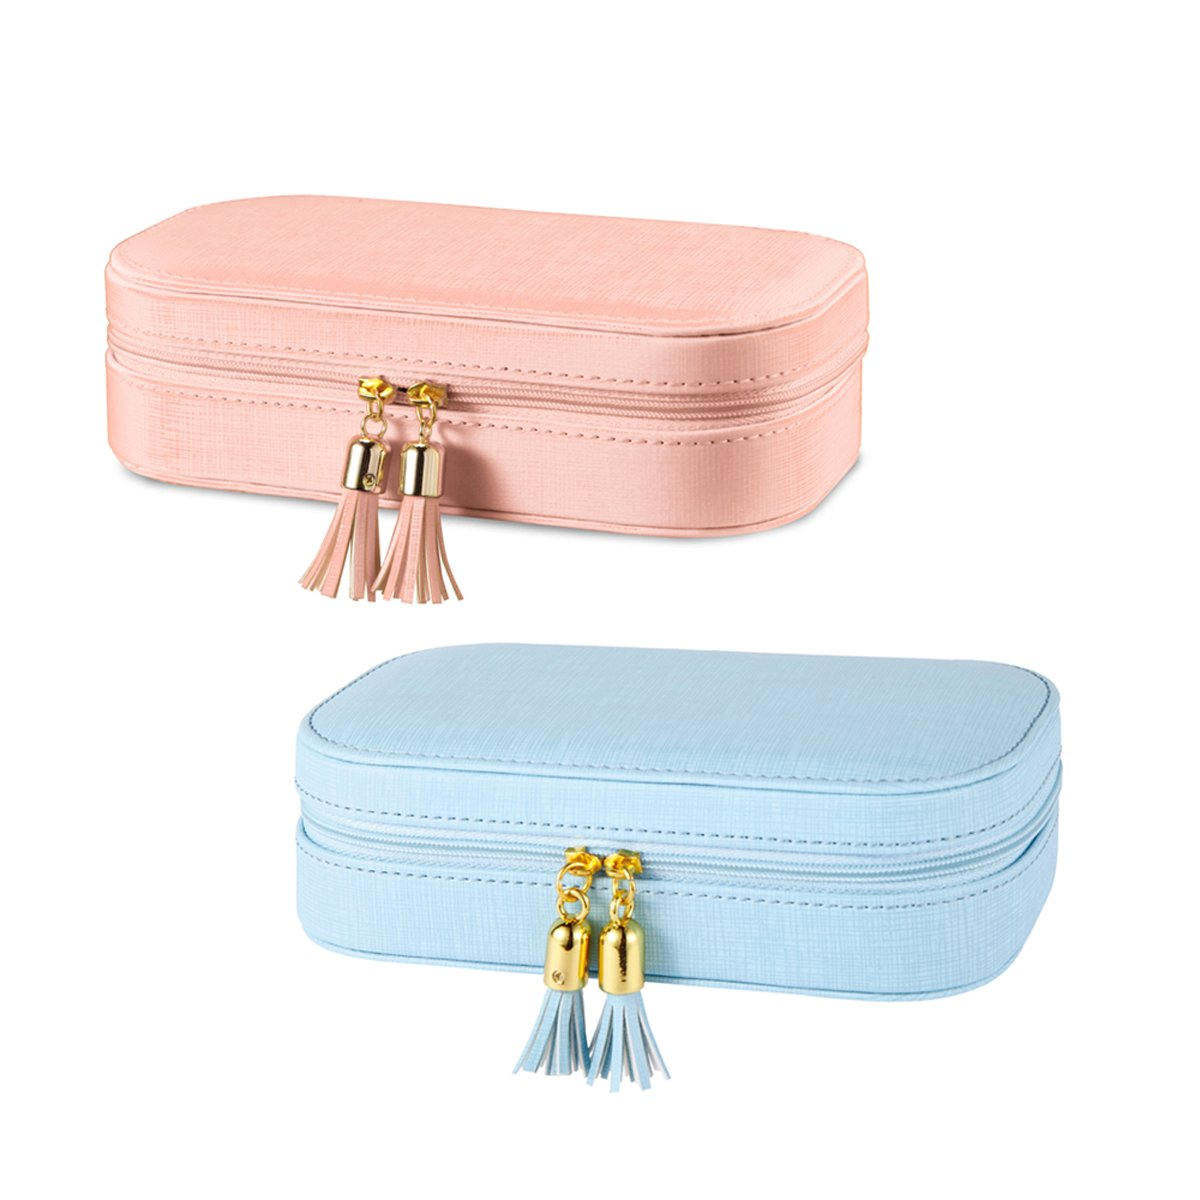 Vlando Small Tassel Travel Jewelry Box Organizer Display Storage Case for Girls Women (NEW TASSEL DESIGN (PINK + BLUE))